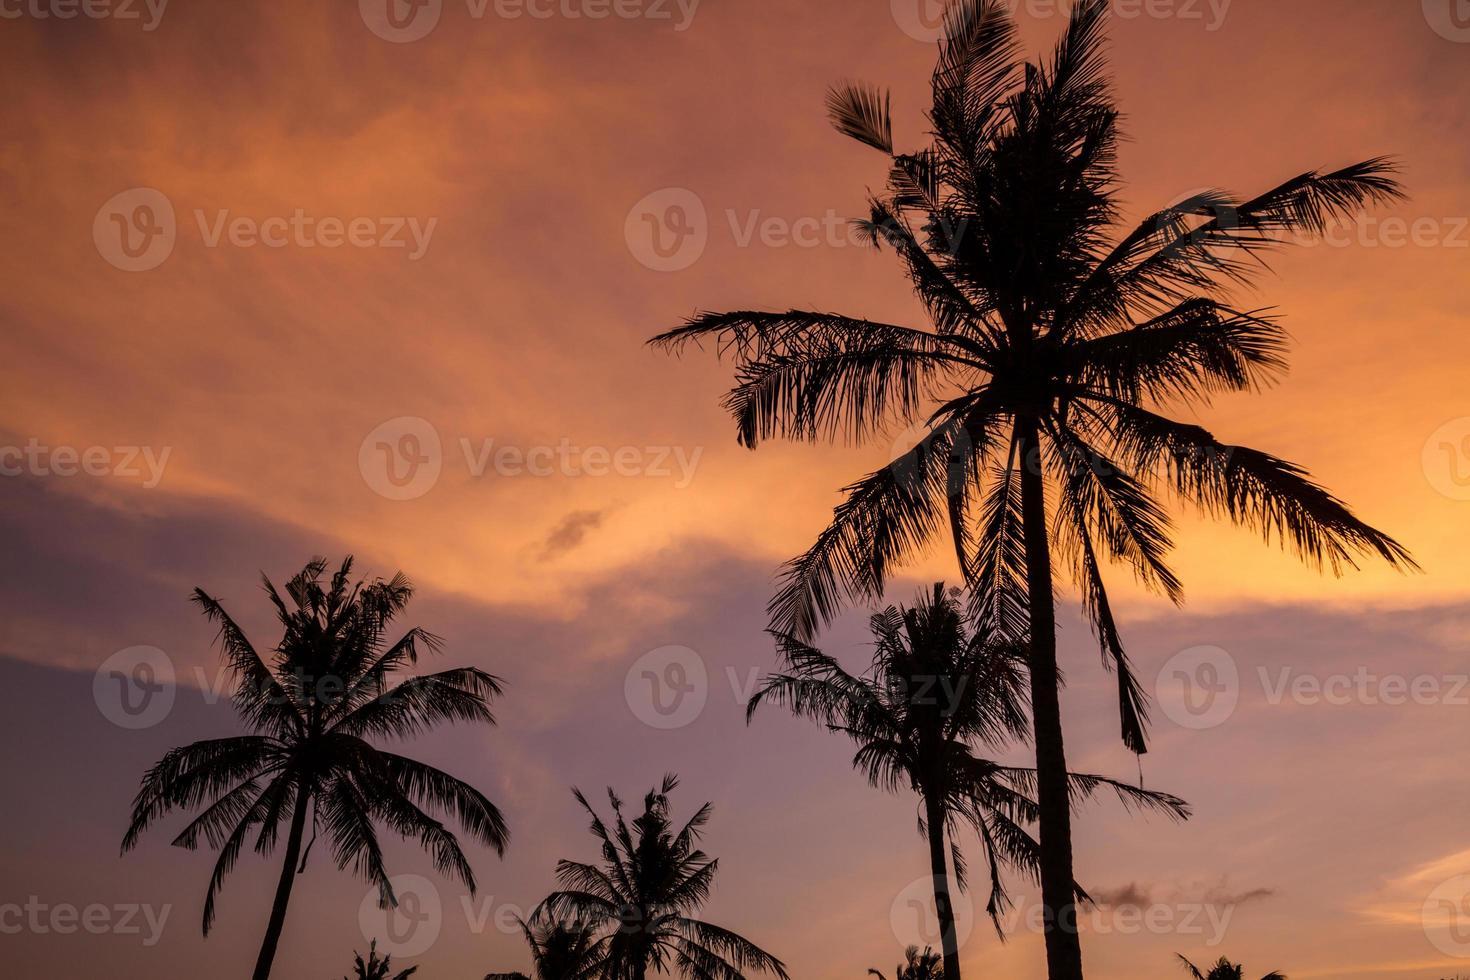 palmeiras na hora do sol. foto